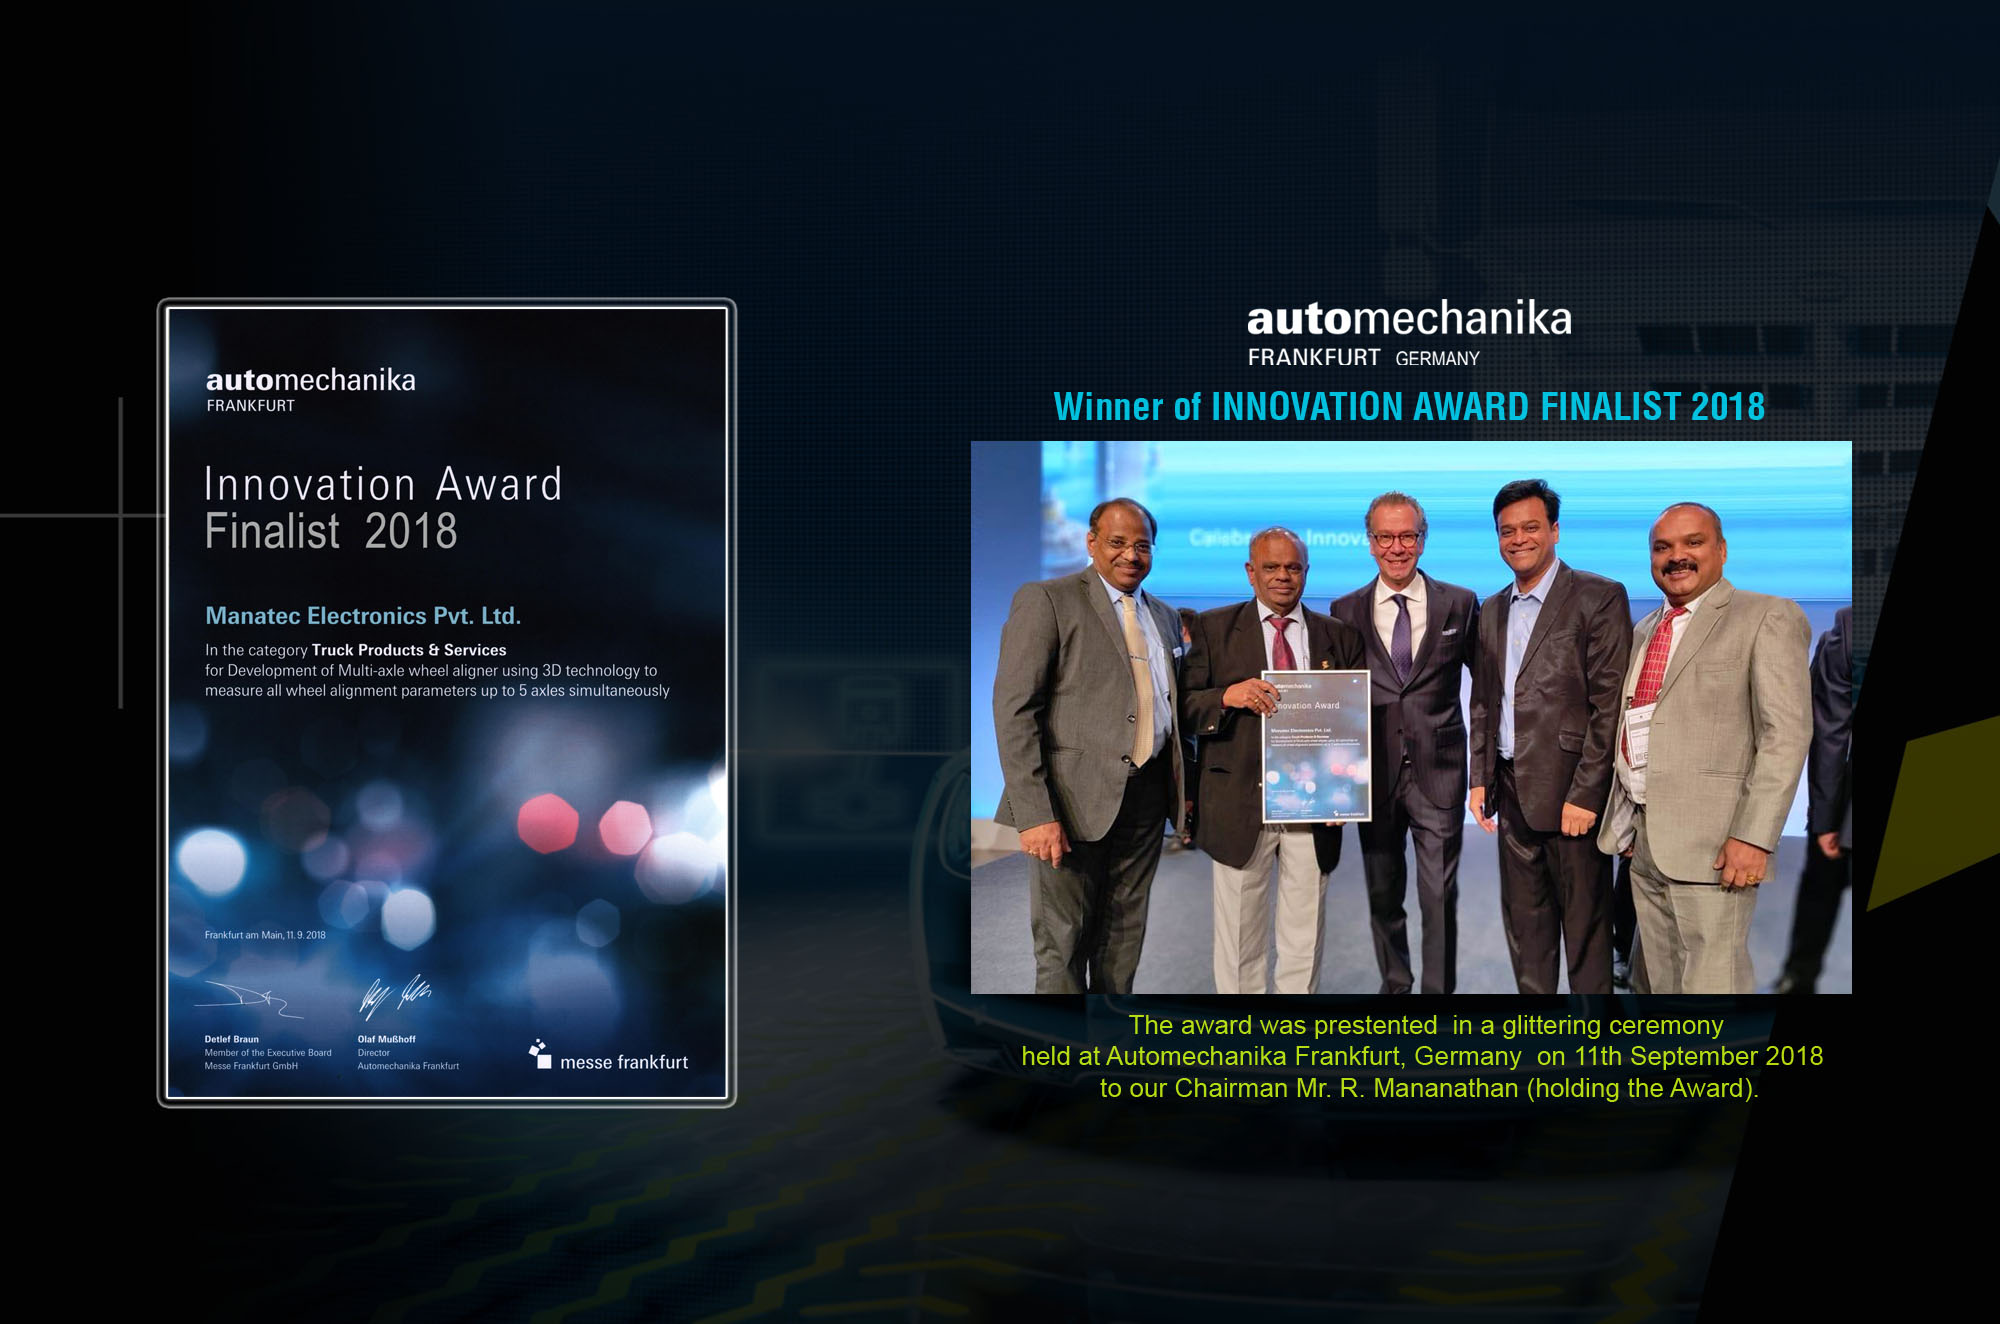 09-Automechanika-Innovation-Award-2018-01